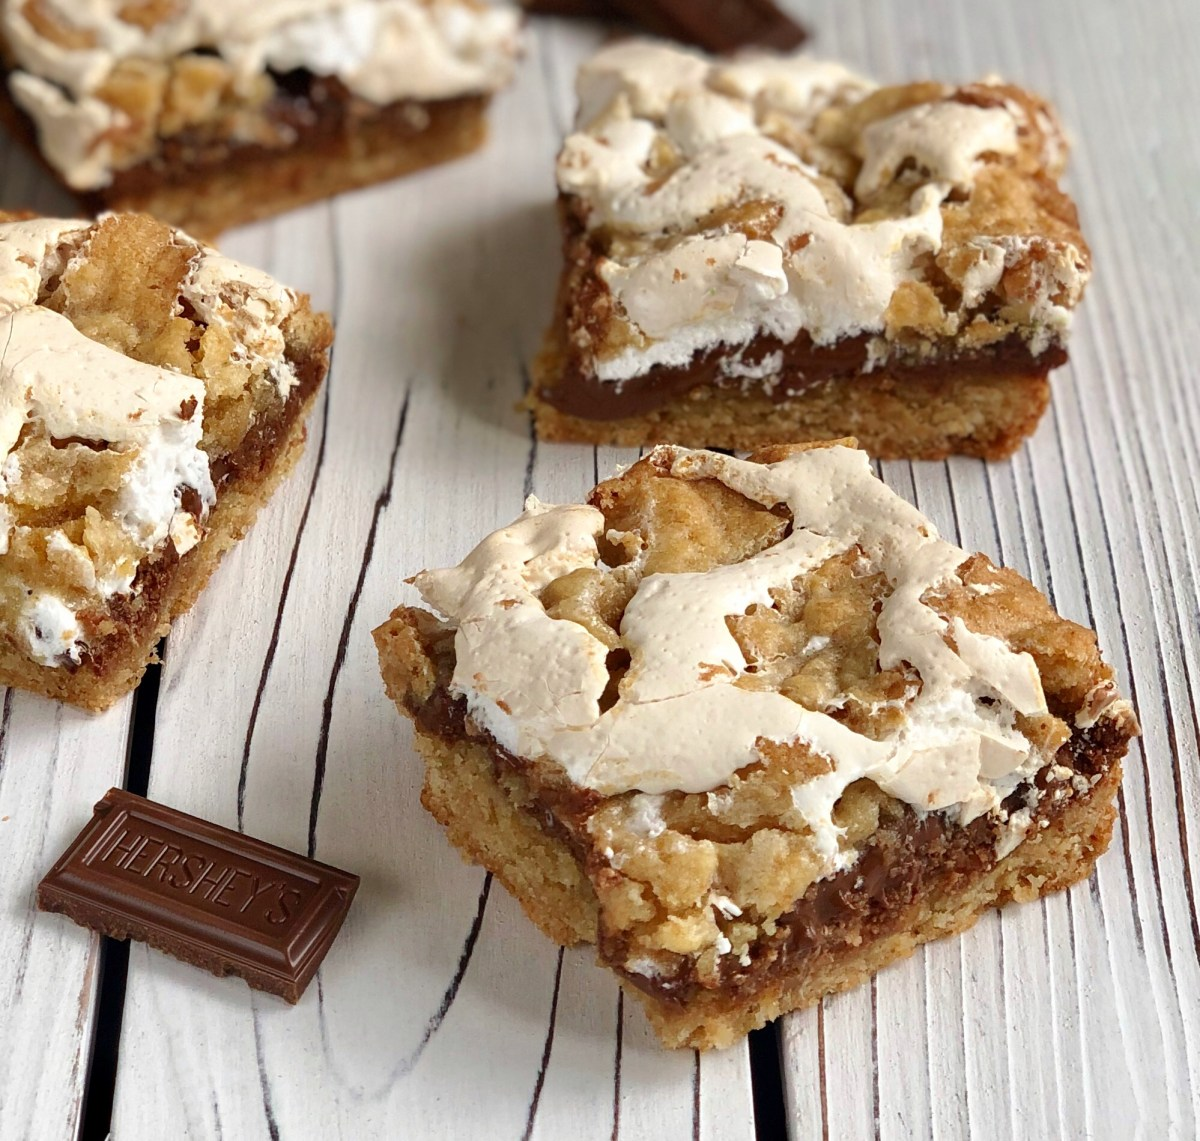 S'mores Bars by Happylifeblogspot.com #smores #cookiesandbars #summerdessert #dessert #marshmallowfluffrecipes #smoresdessert